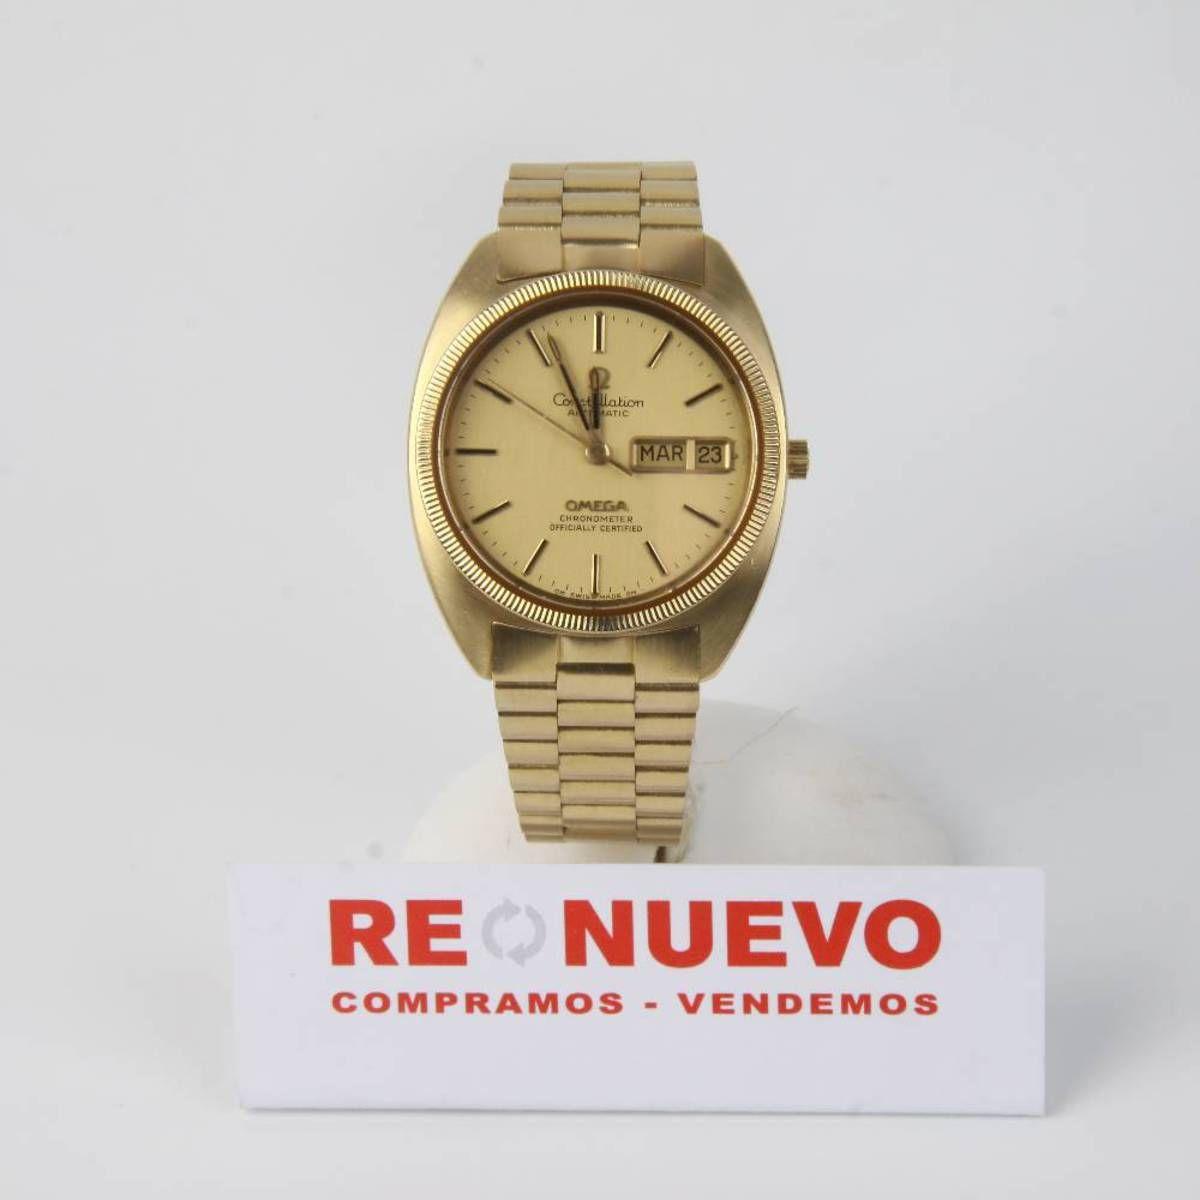 1623a1cd29ed Reloj OMEGA CONSTELLATION de oro de segunda mano E271884